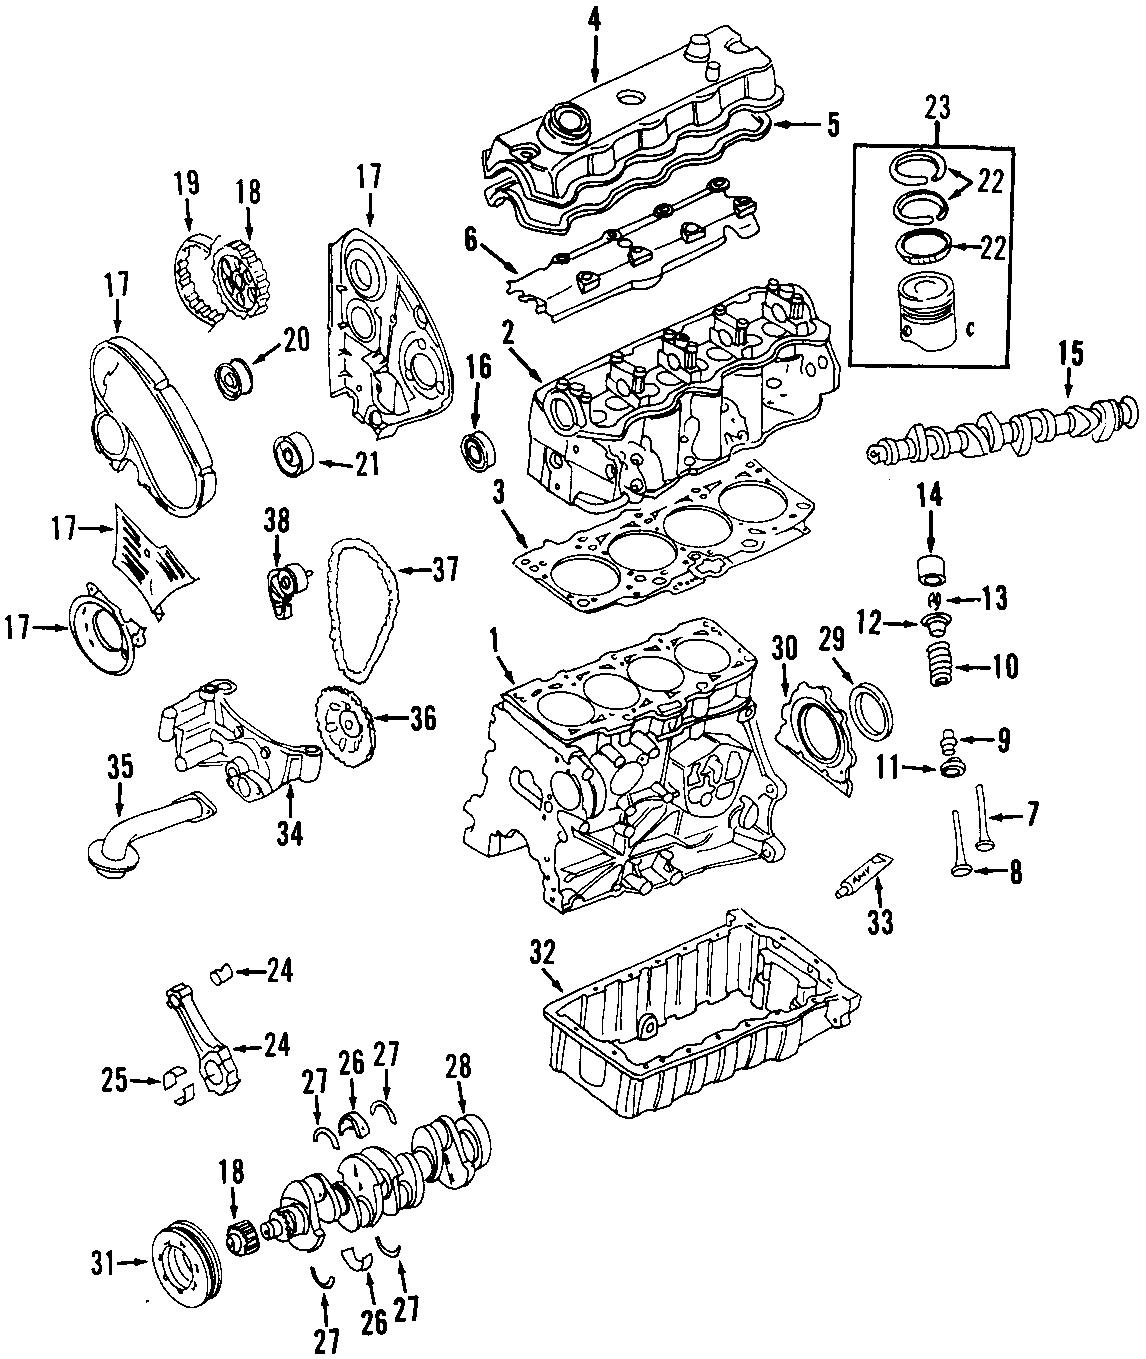 Volkswagen Beetle Engine Piston Ring Bearings Cylinder